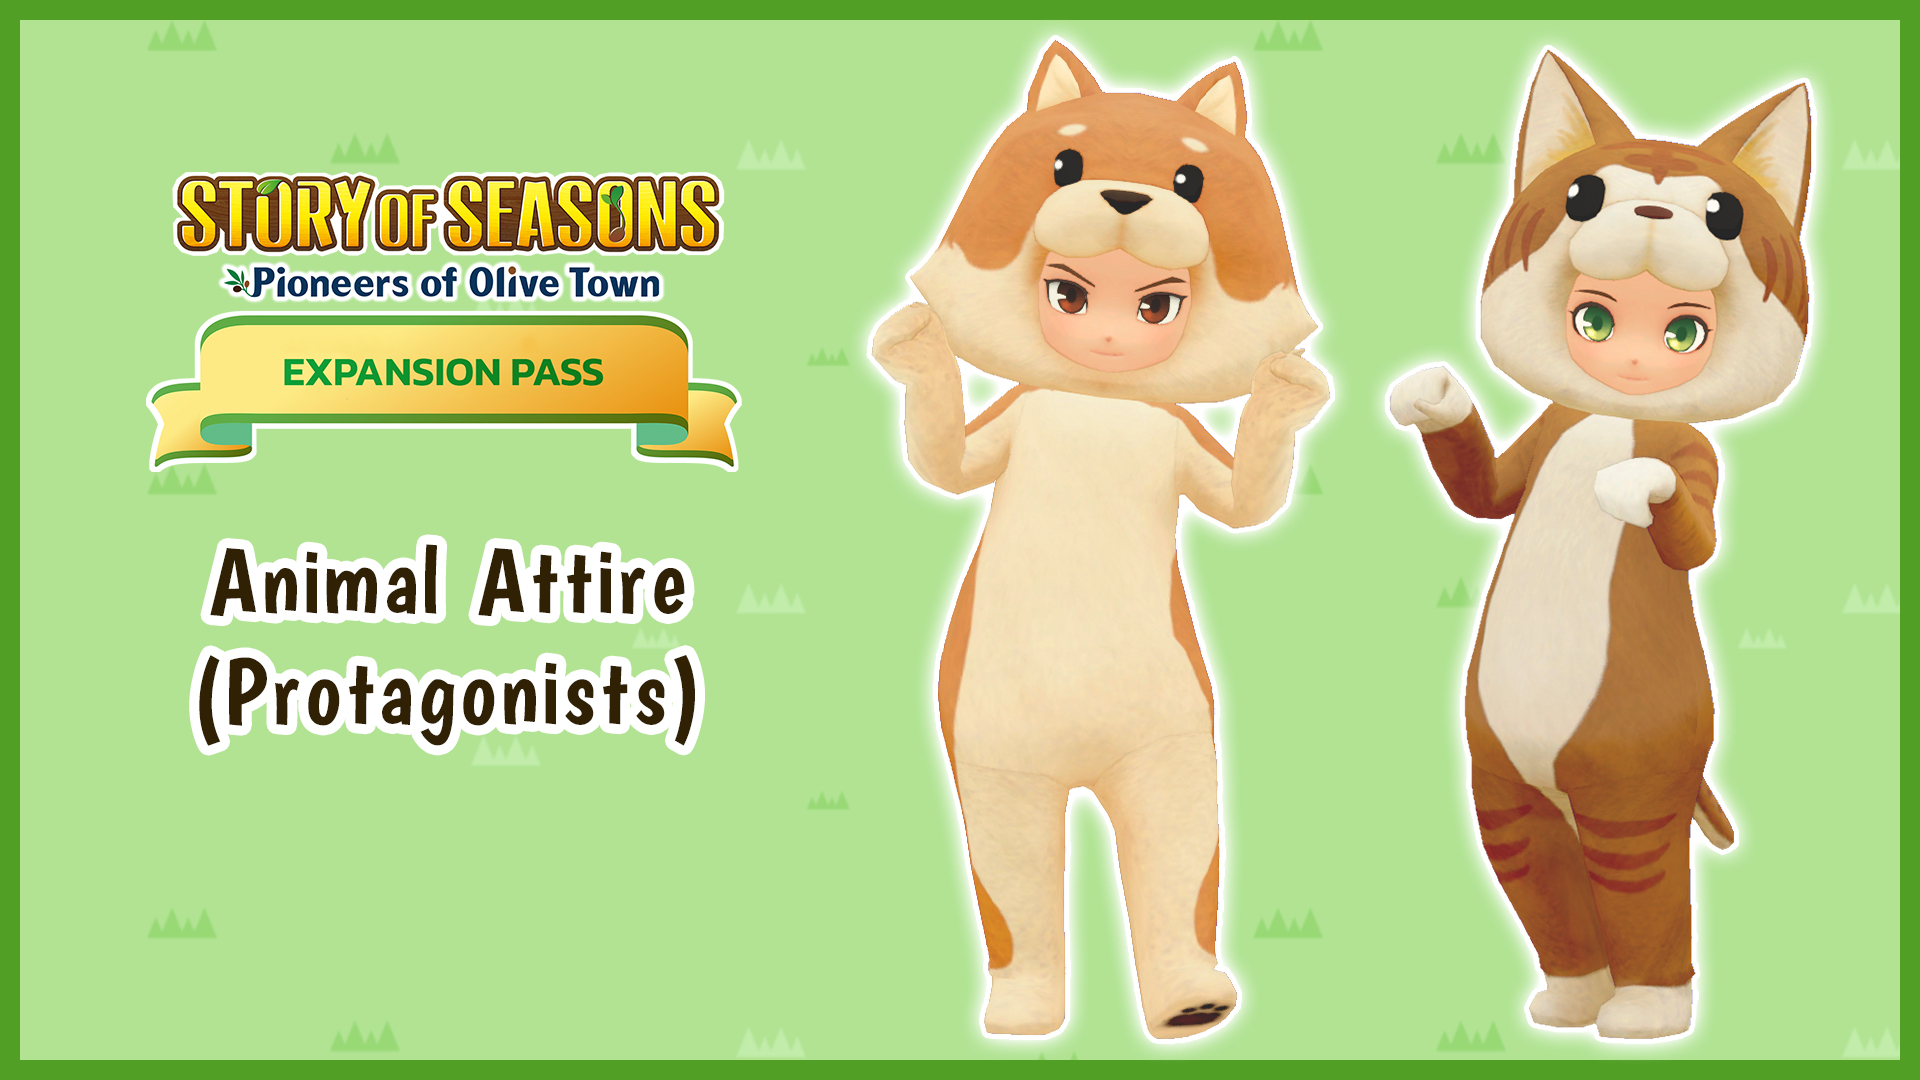 Animal Attire (Protagonists)